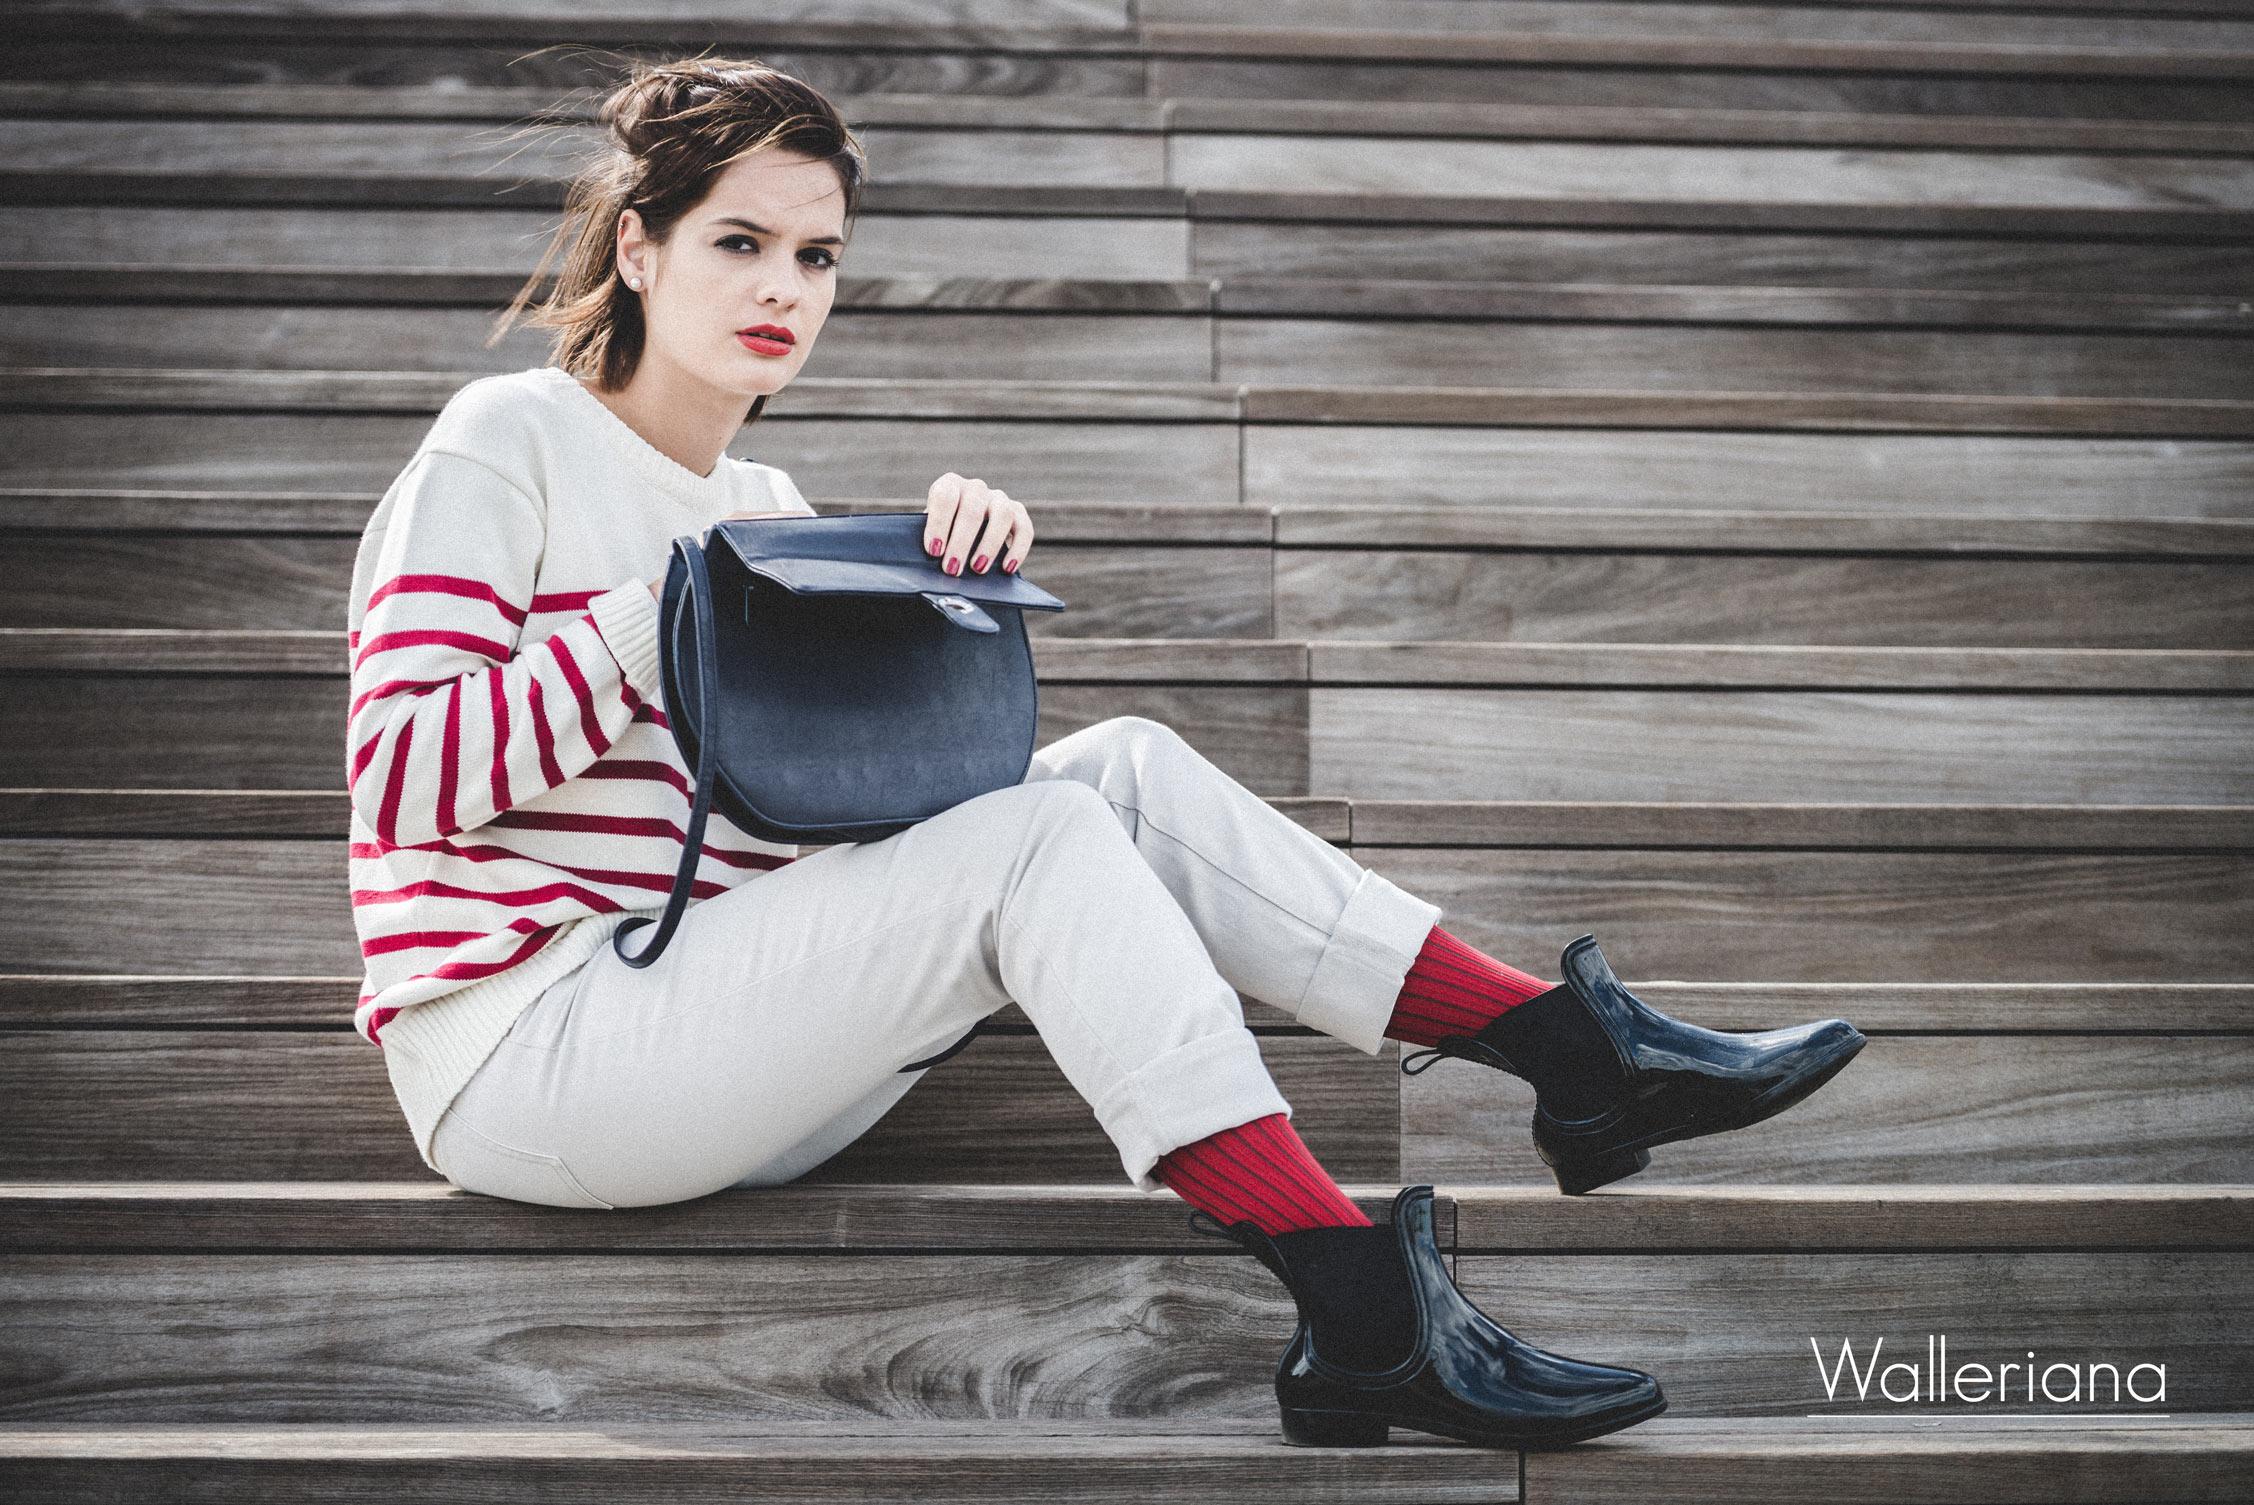 Omagazine parle de Walleriana